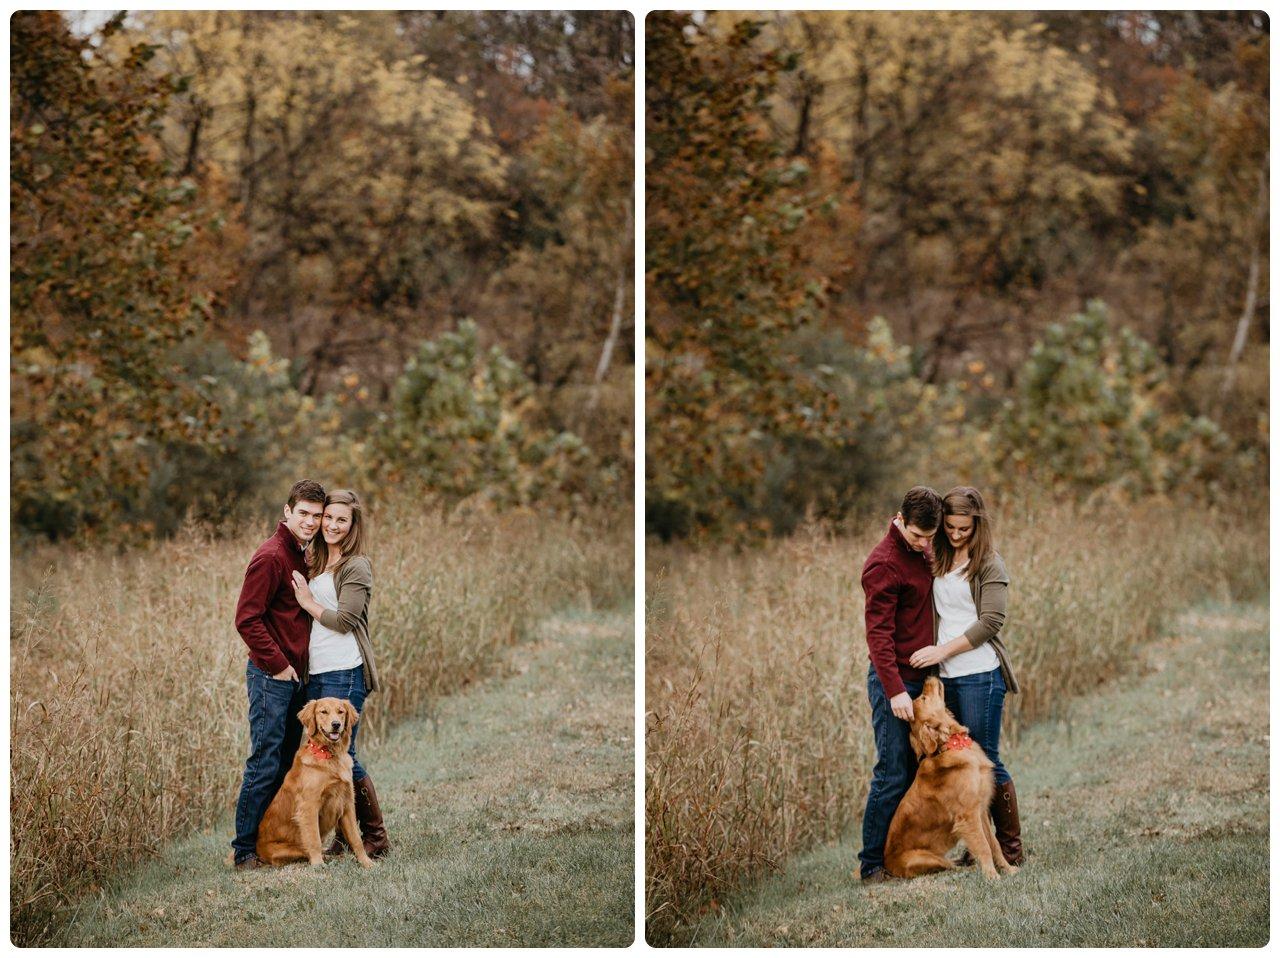 Engagement-Wedding-Photographer-Virginia-Best-Pat-Cori-Photography-001.jpg